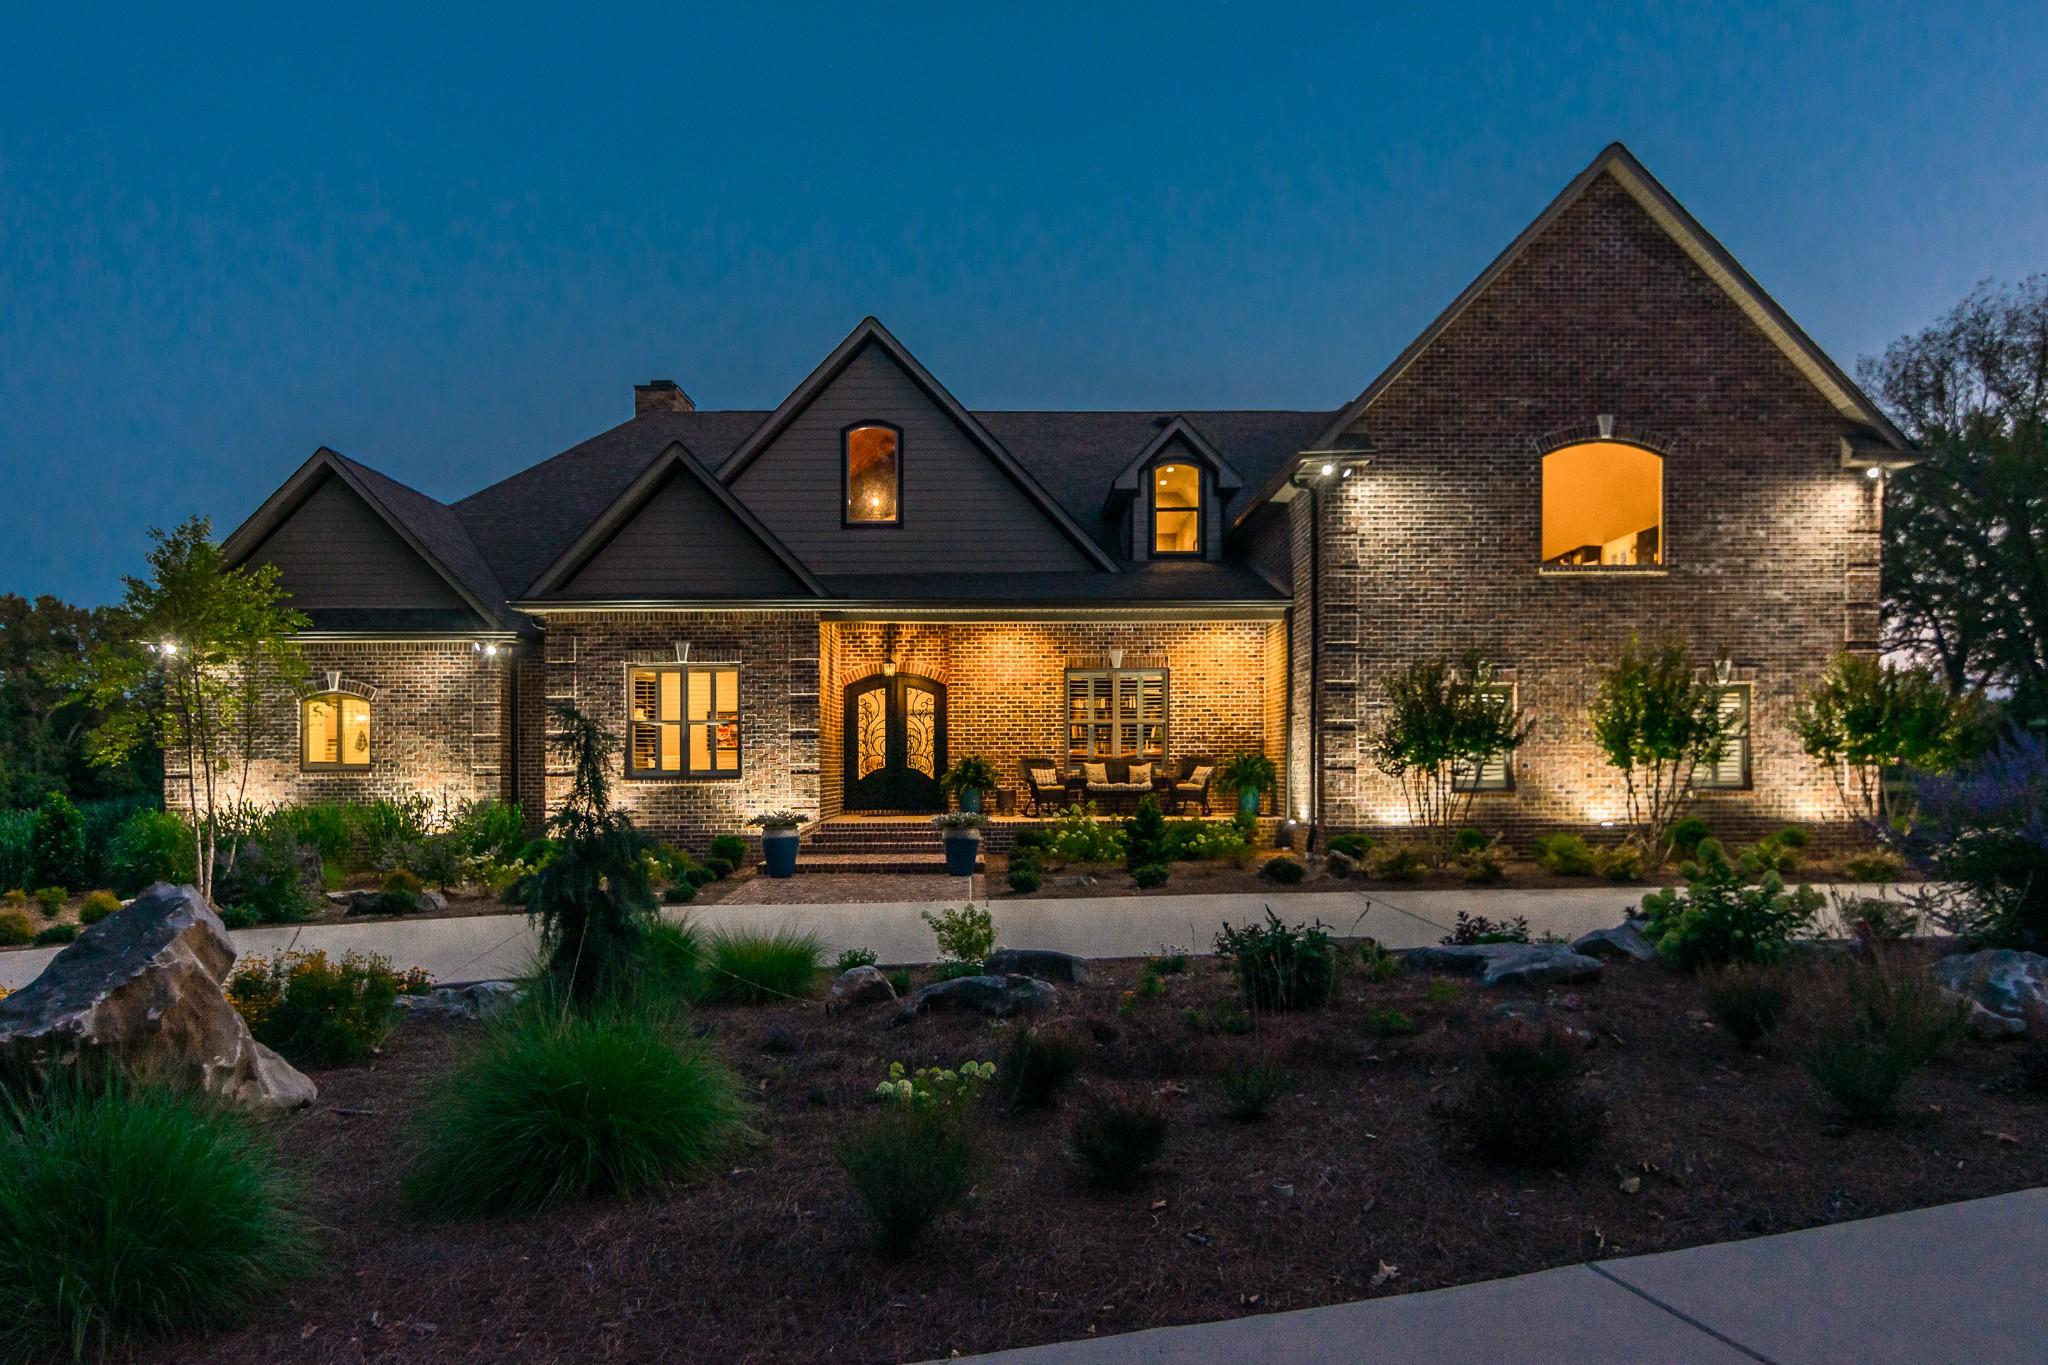 7265 Highway 25 E Property Photo - Cross Plains, TN real estate listing